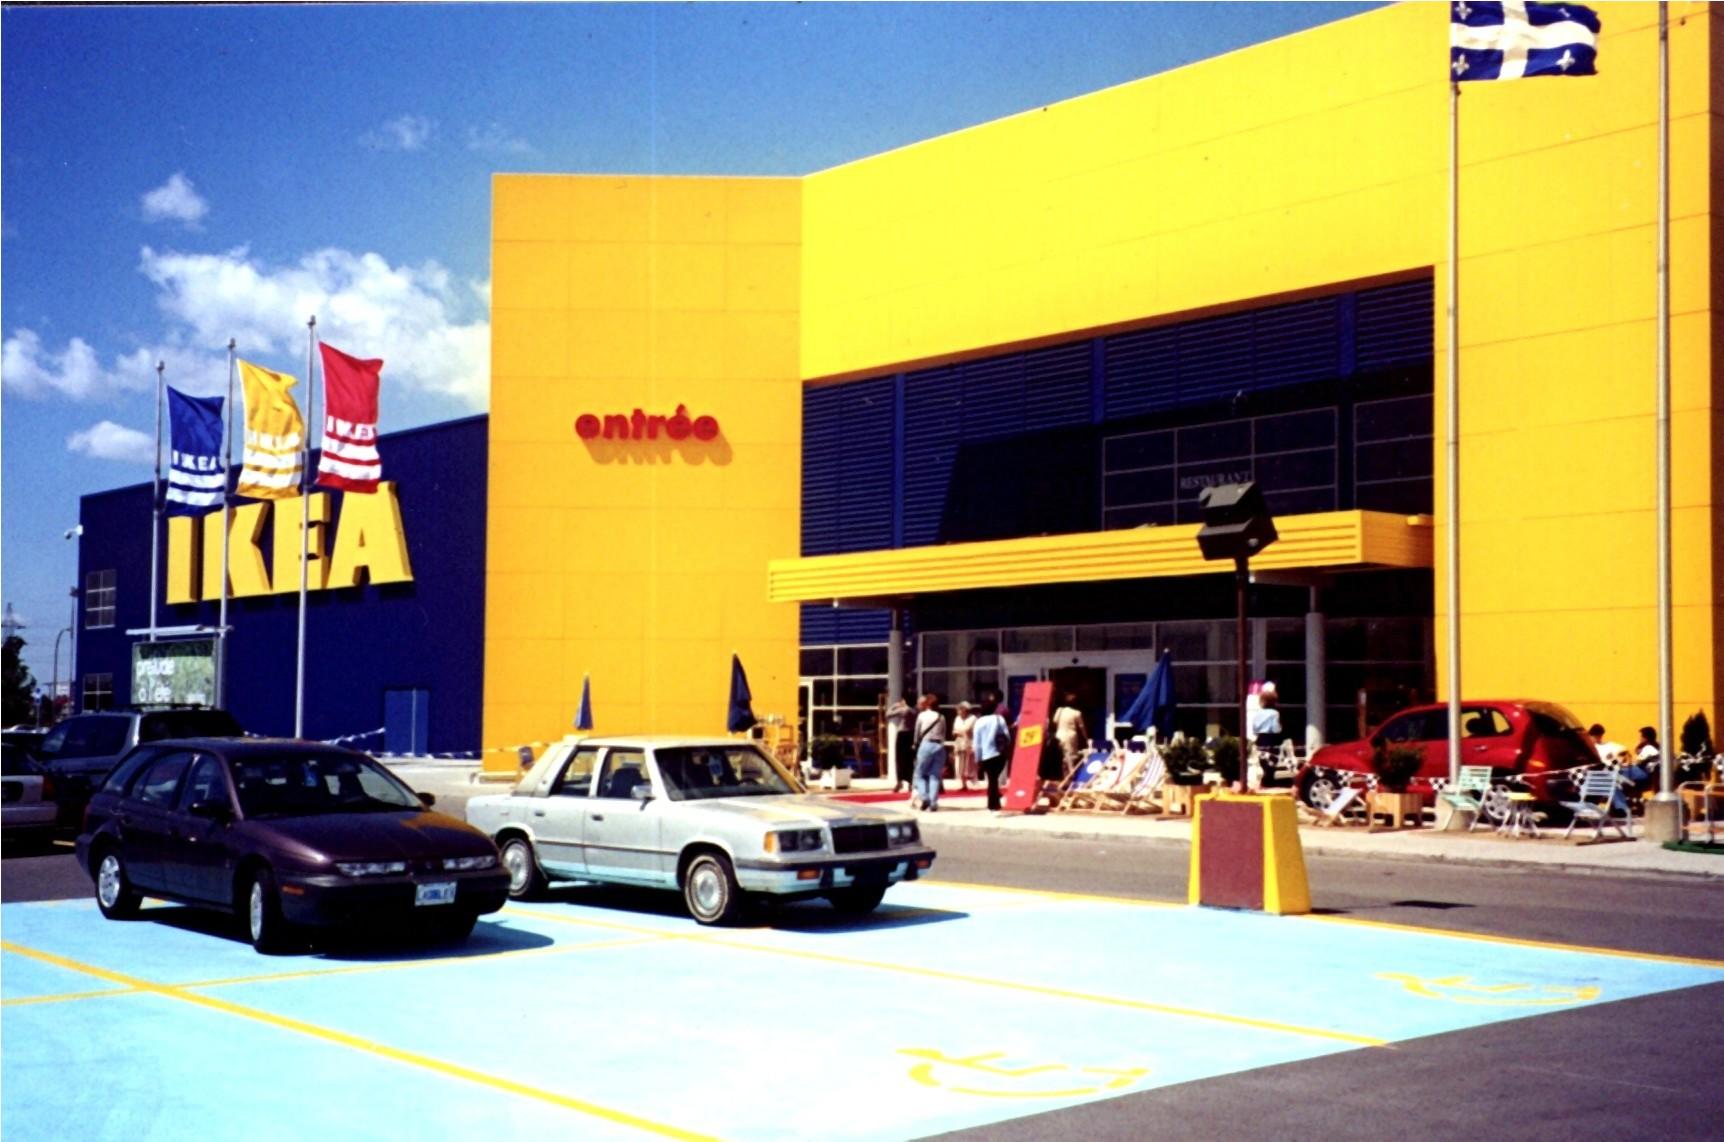 Ikea Montreal.JPG